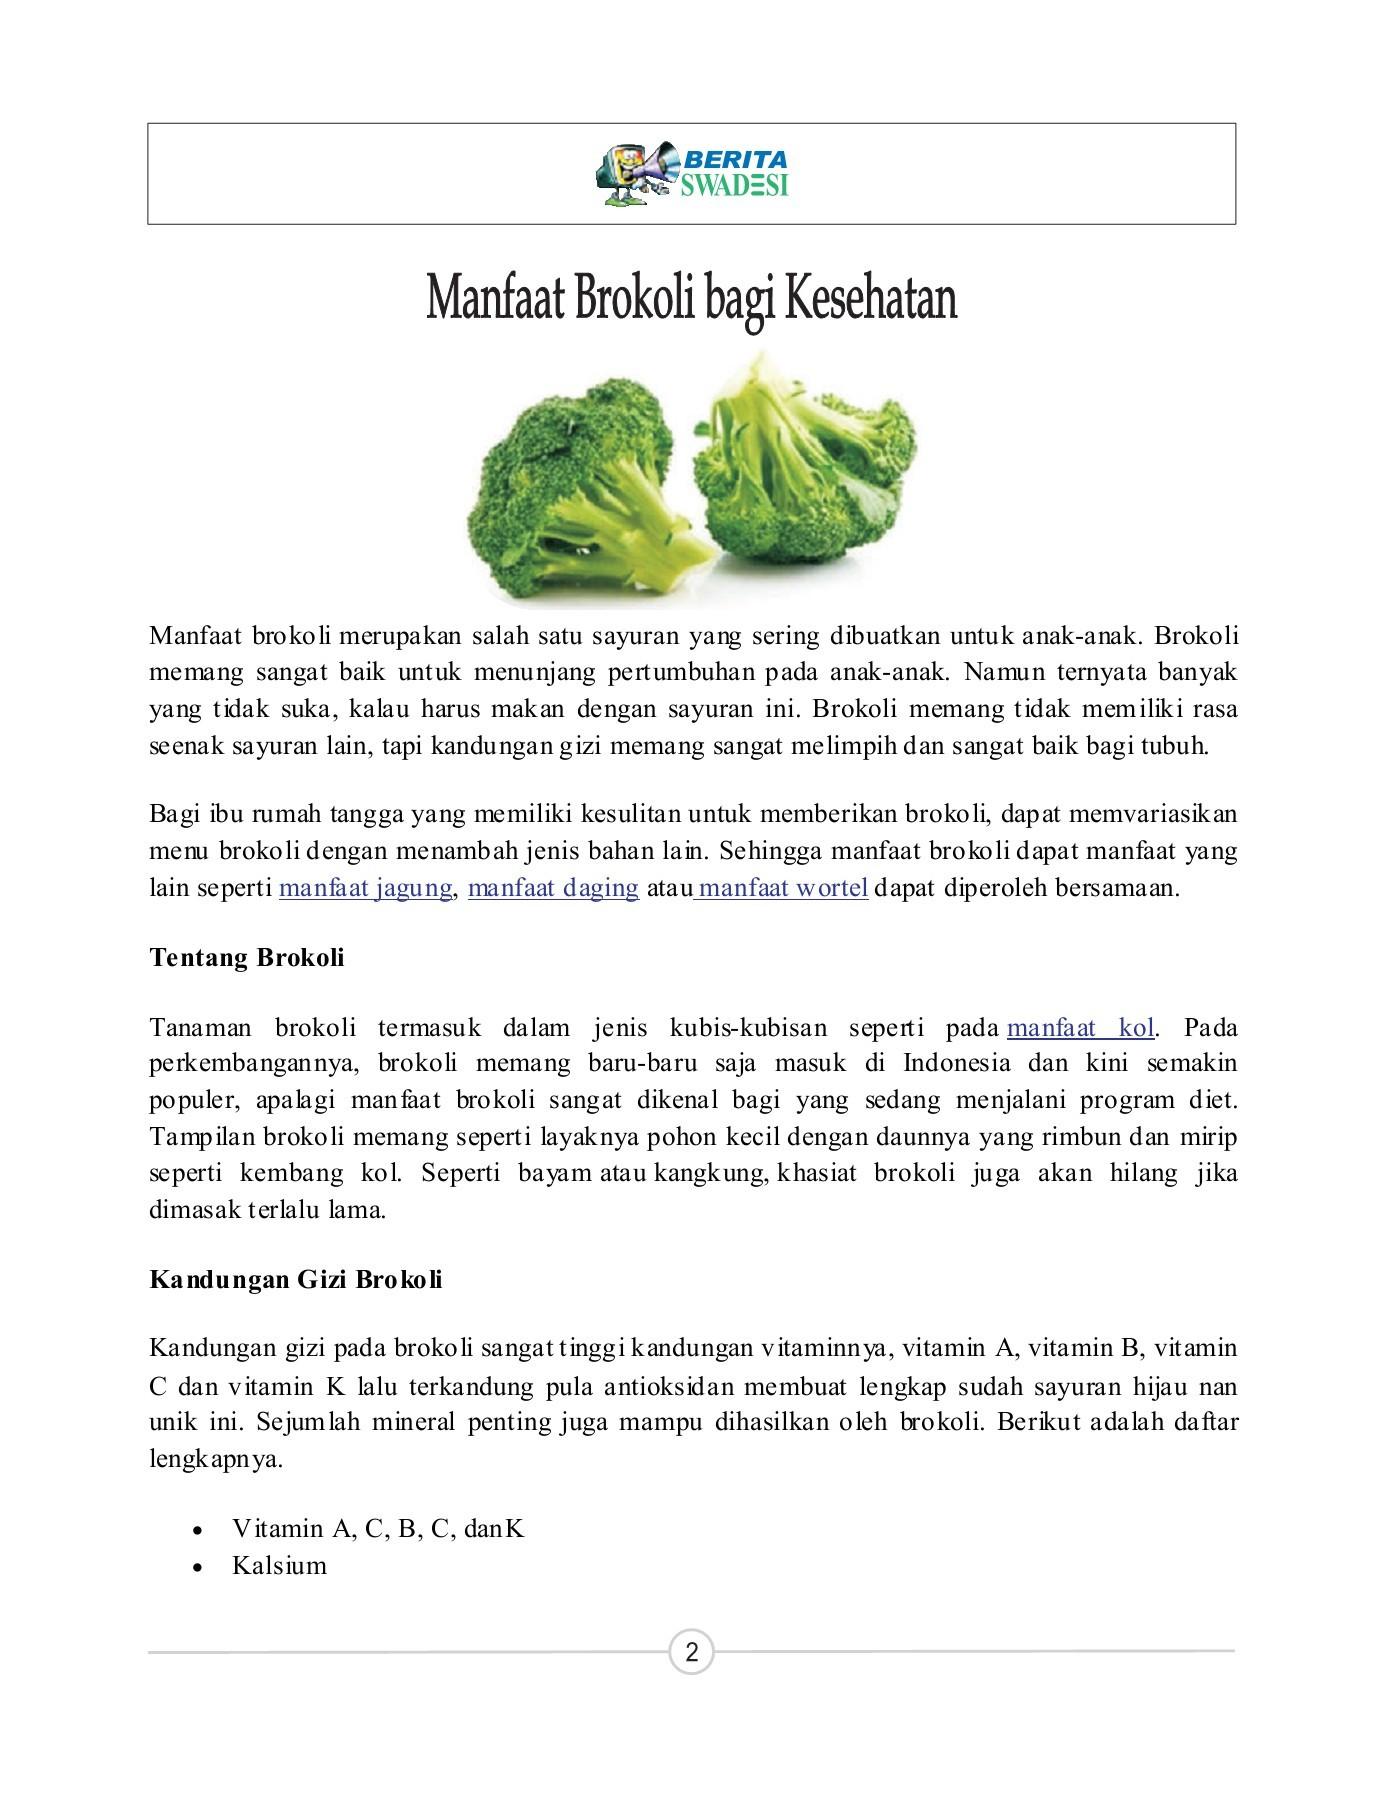 Jenis Jenis Sayuran Dan Kandungan Vitaminnya : jenis, sayuran, kandungan, vitaminnya, KILAS, Pages, Download, FlipHTML5